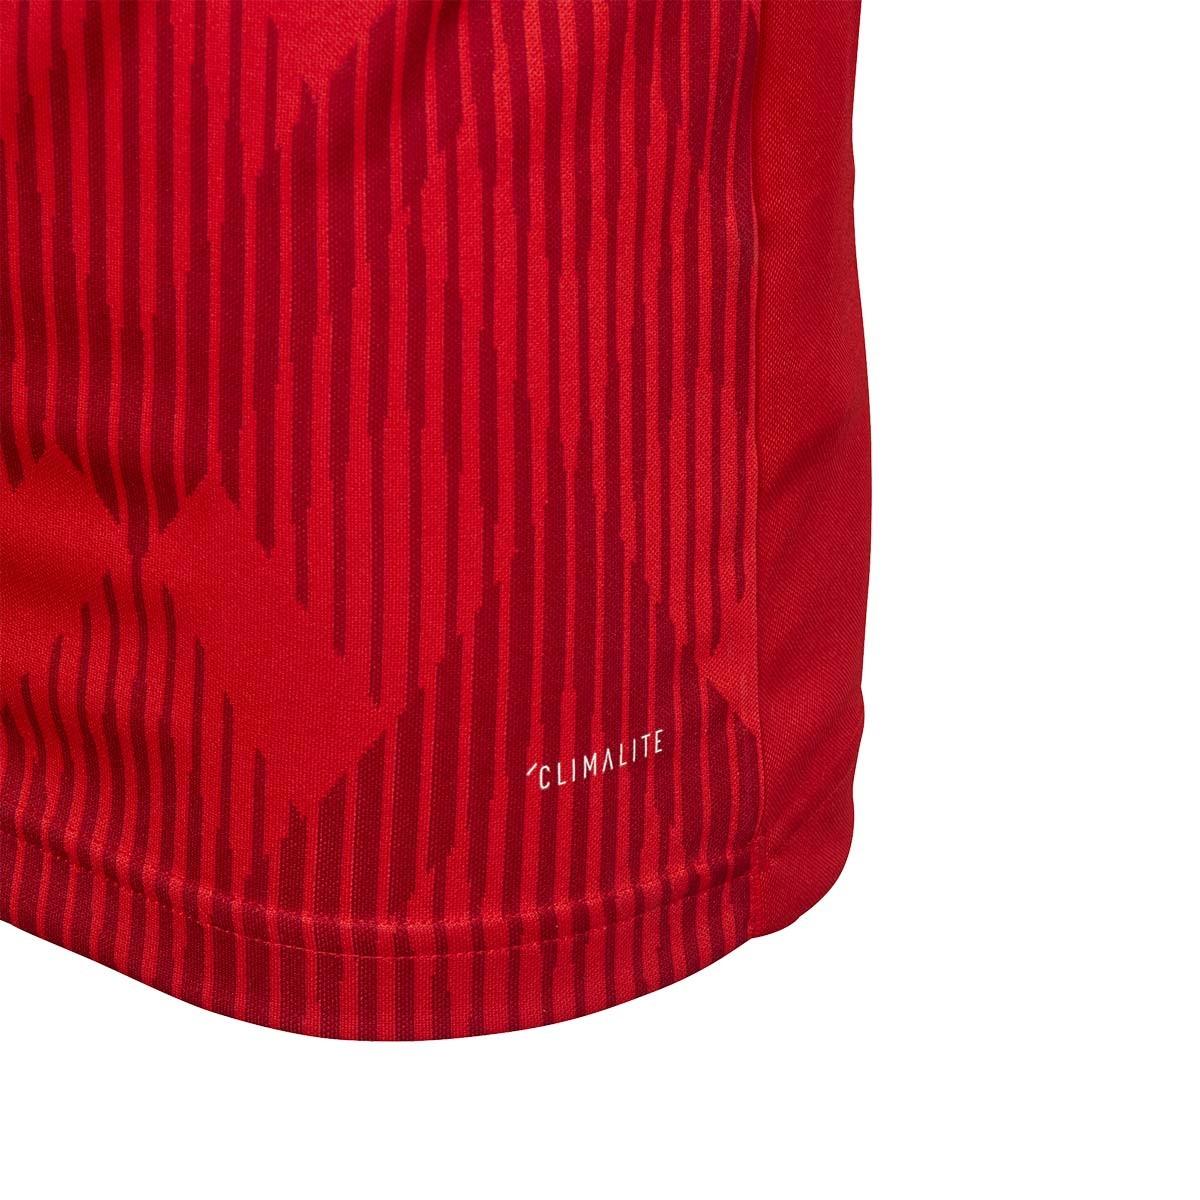 Camiseta adidas FC Bayern Munich Primera Equipación 2018-2019 Niño True  red-Strong red-White - Soloporteros es ahora Fútbol Emotion db7afd2e05396